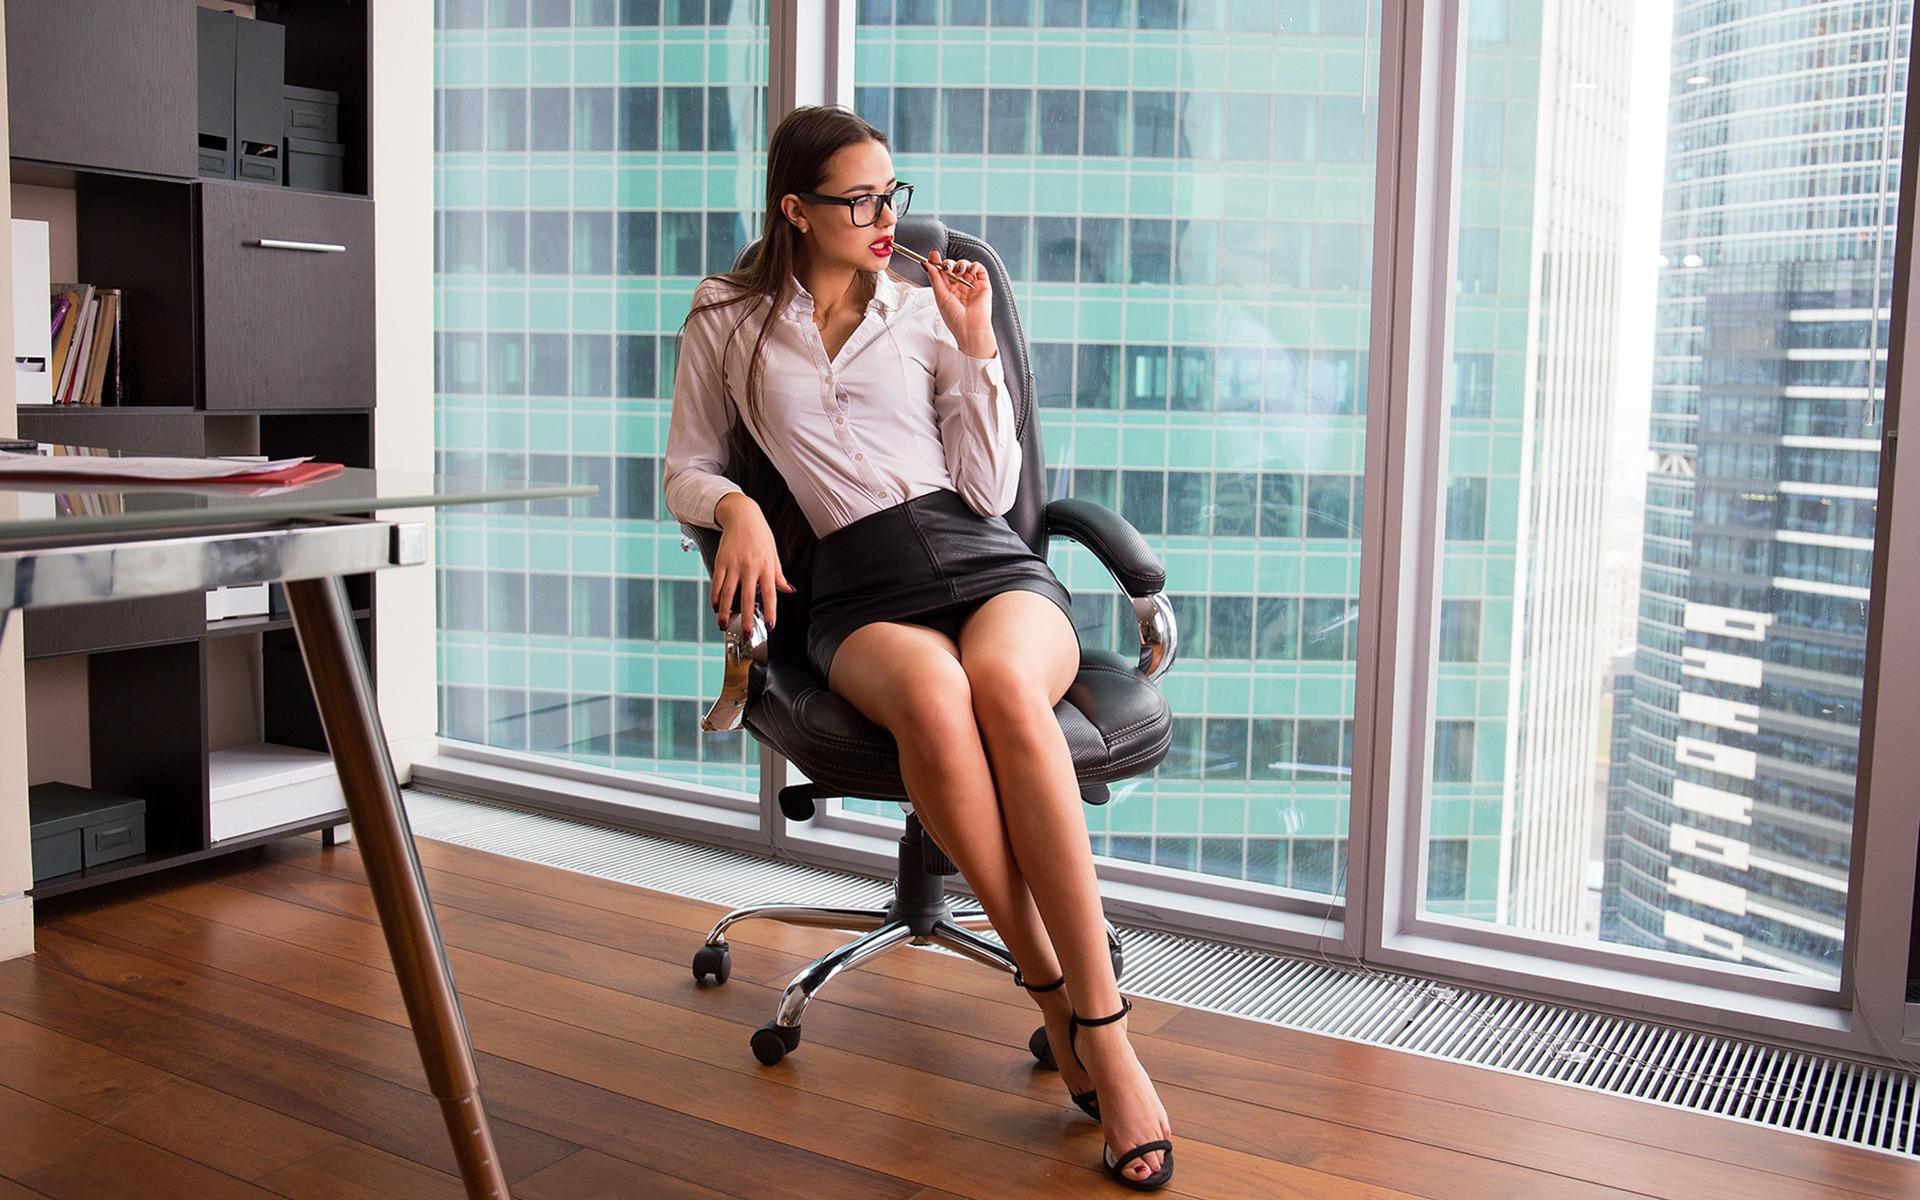 sexy-girls-in-office-petite-teen-gallery-nude